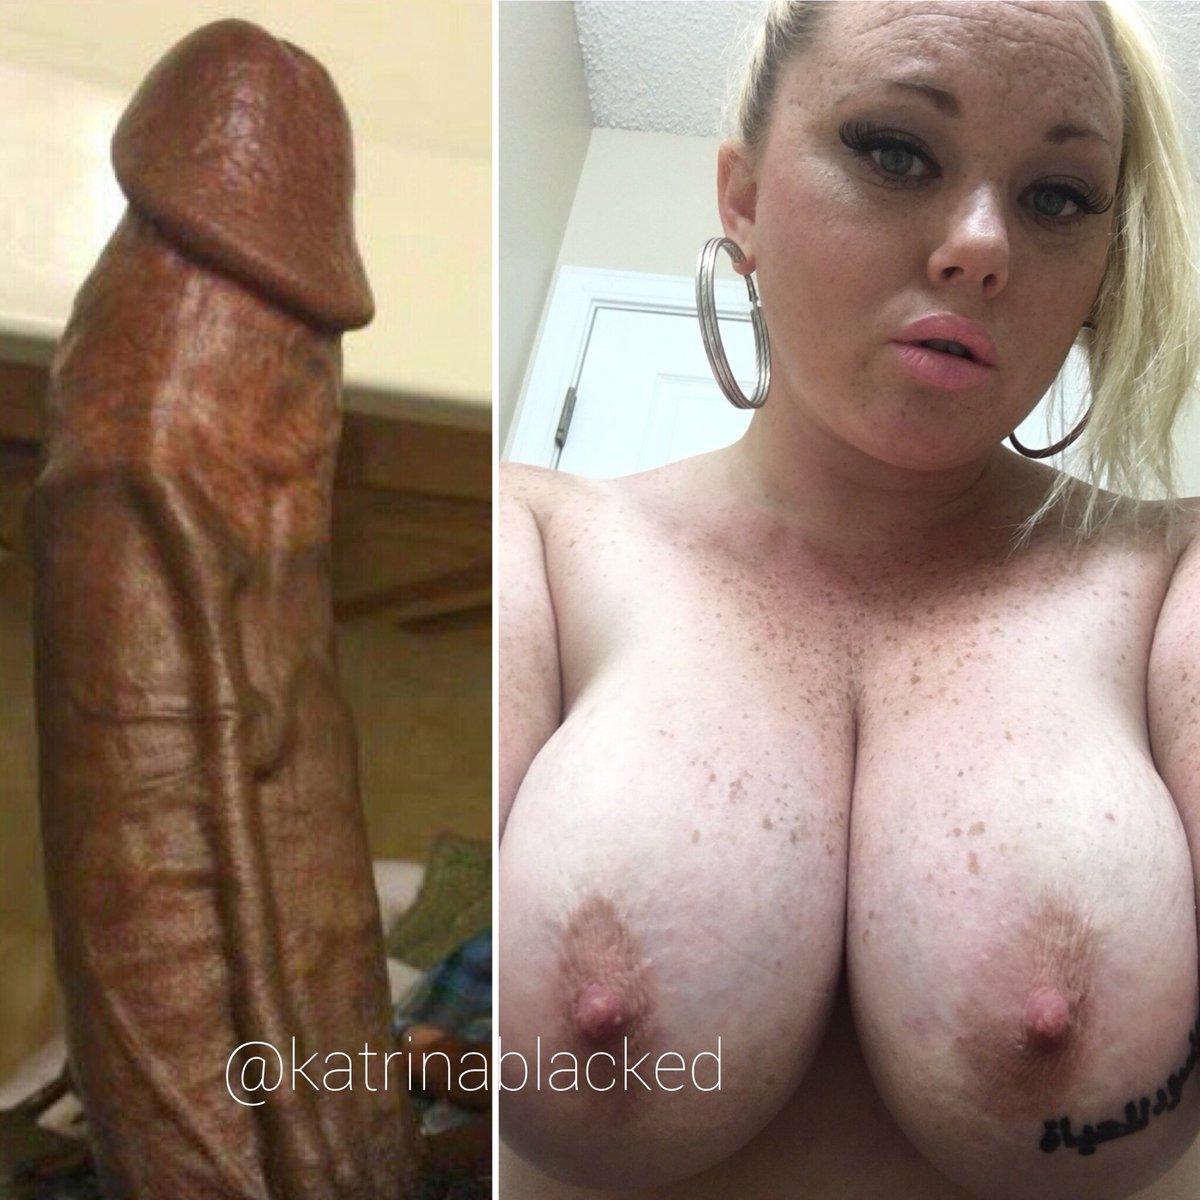 Black lesbian double penetration